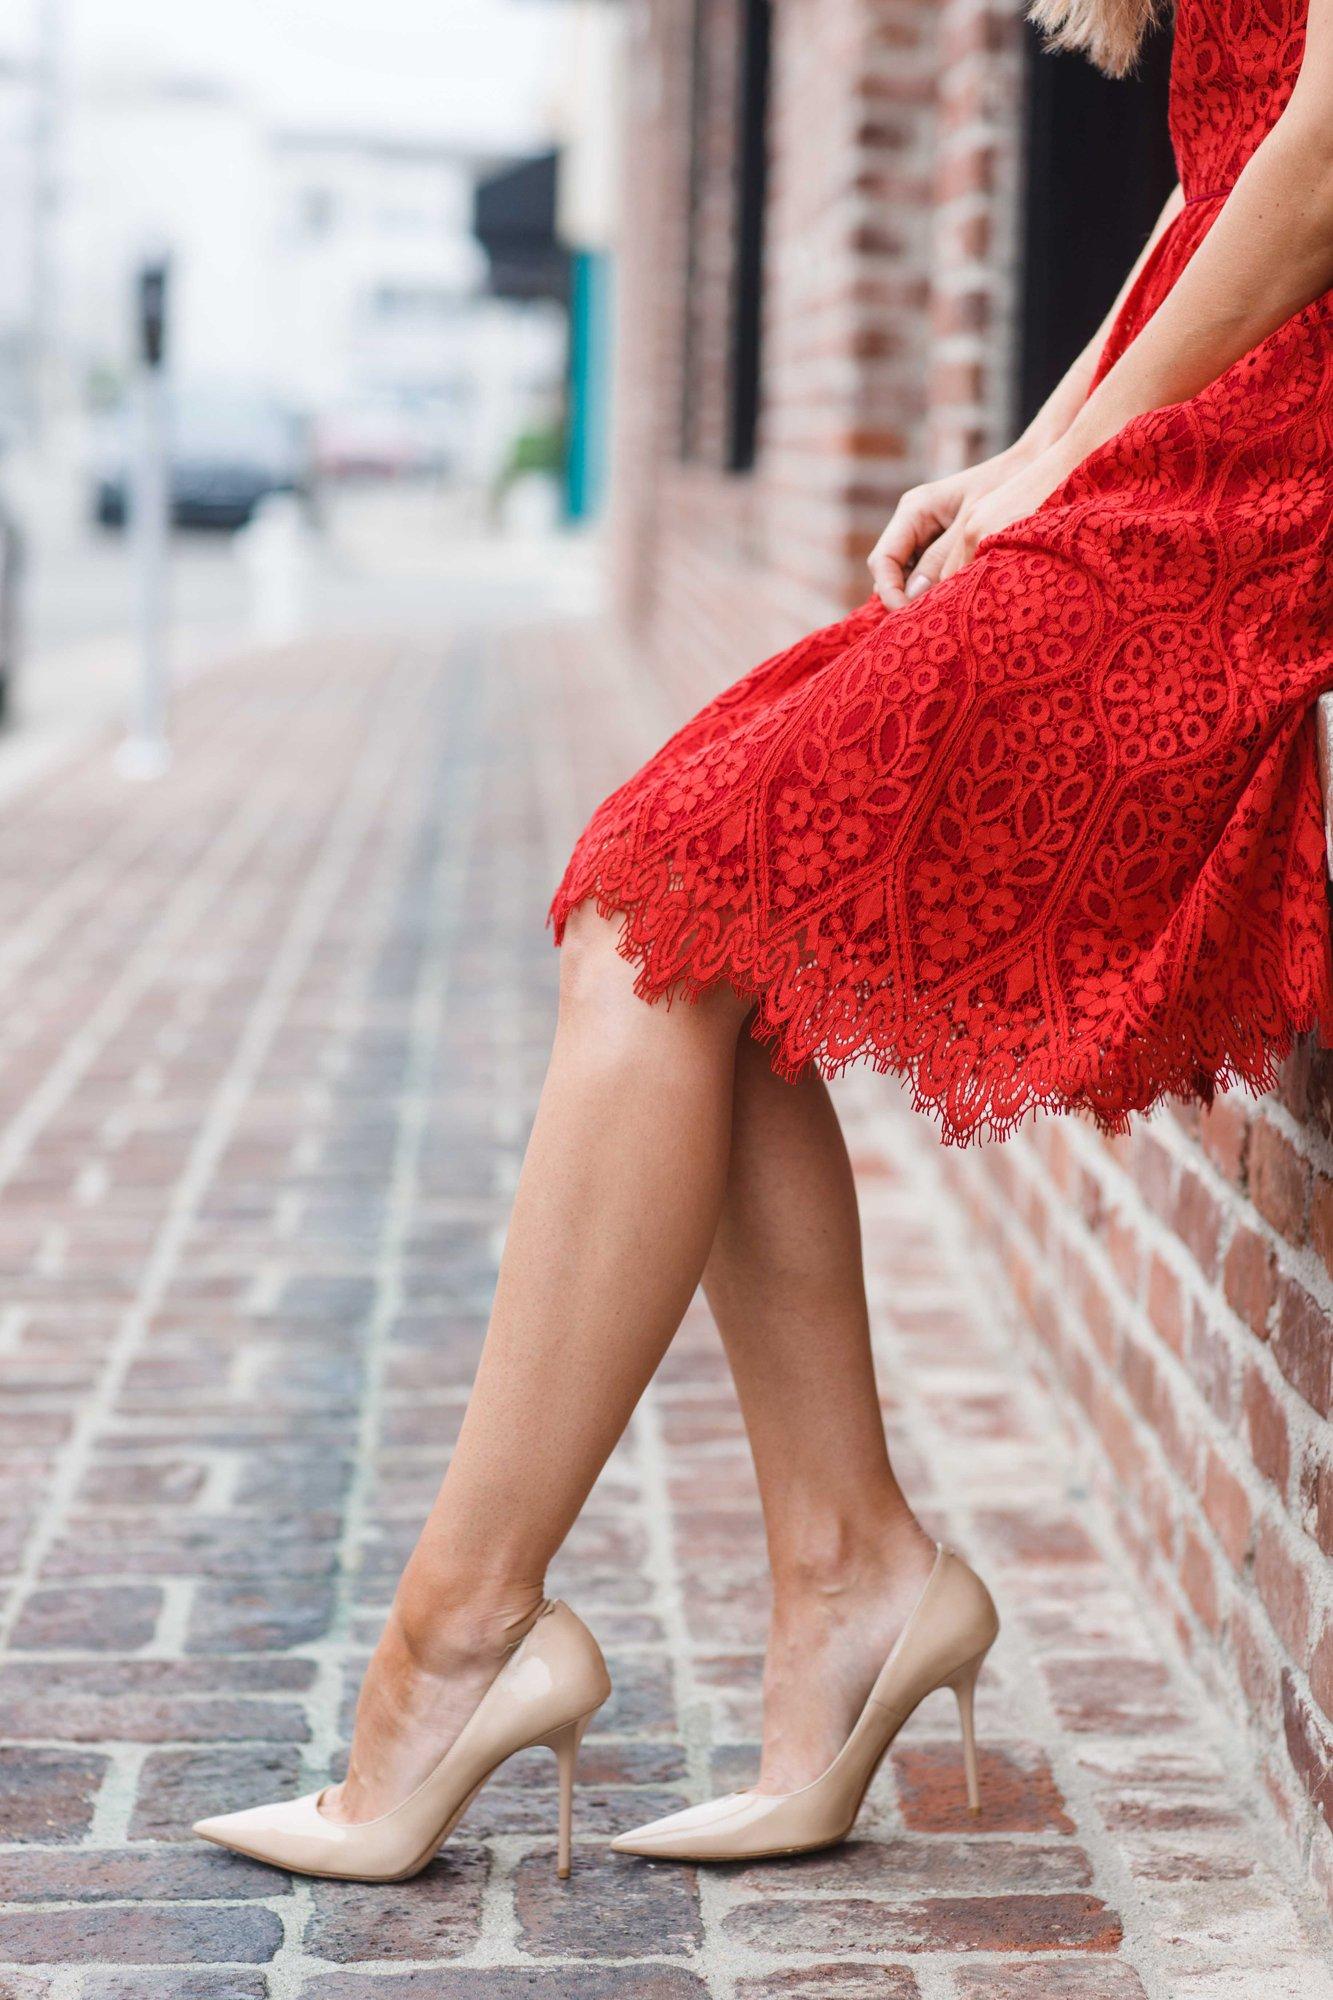 Little Red Lace Dress Merrick's Art